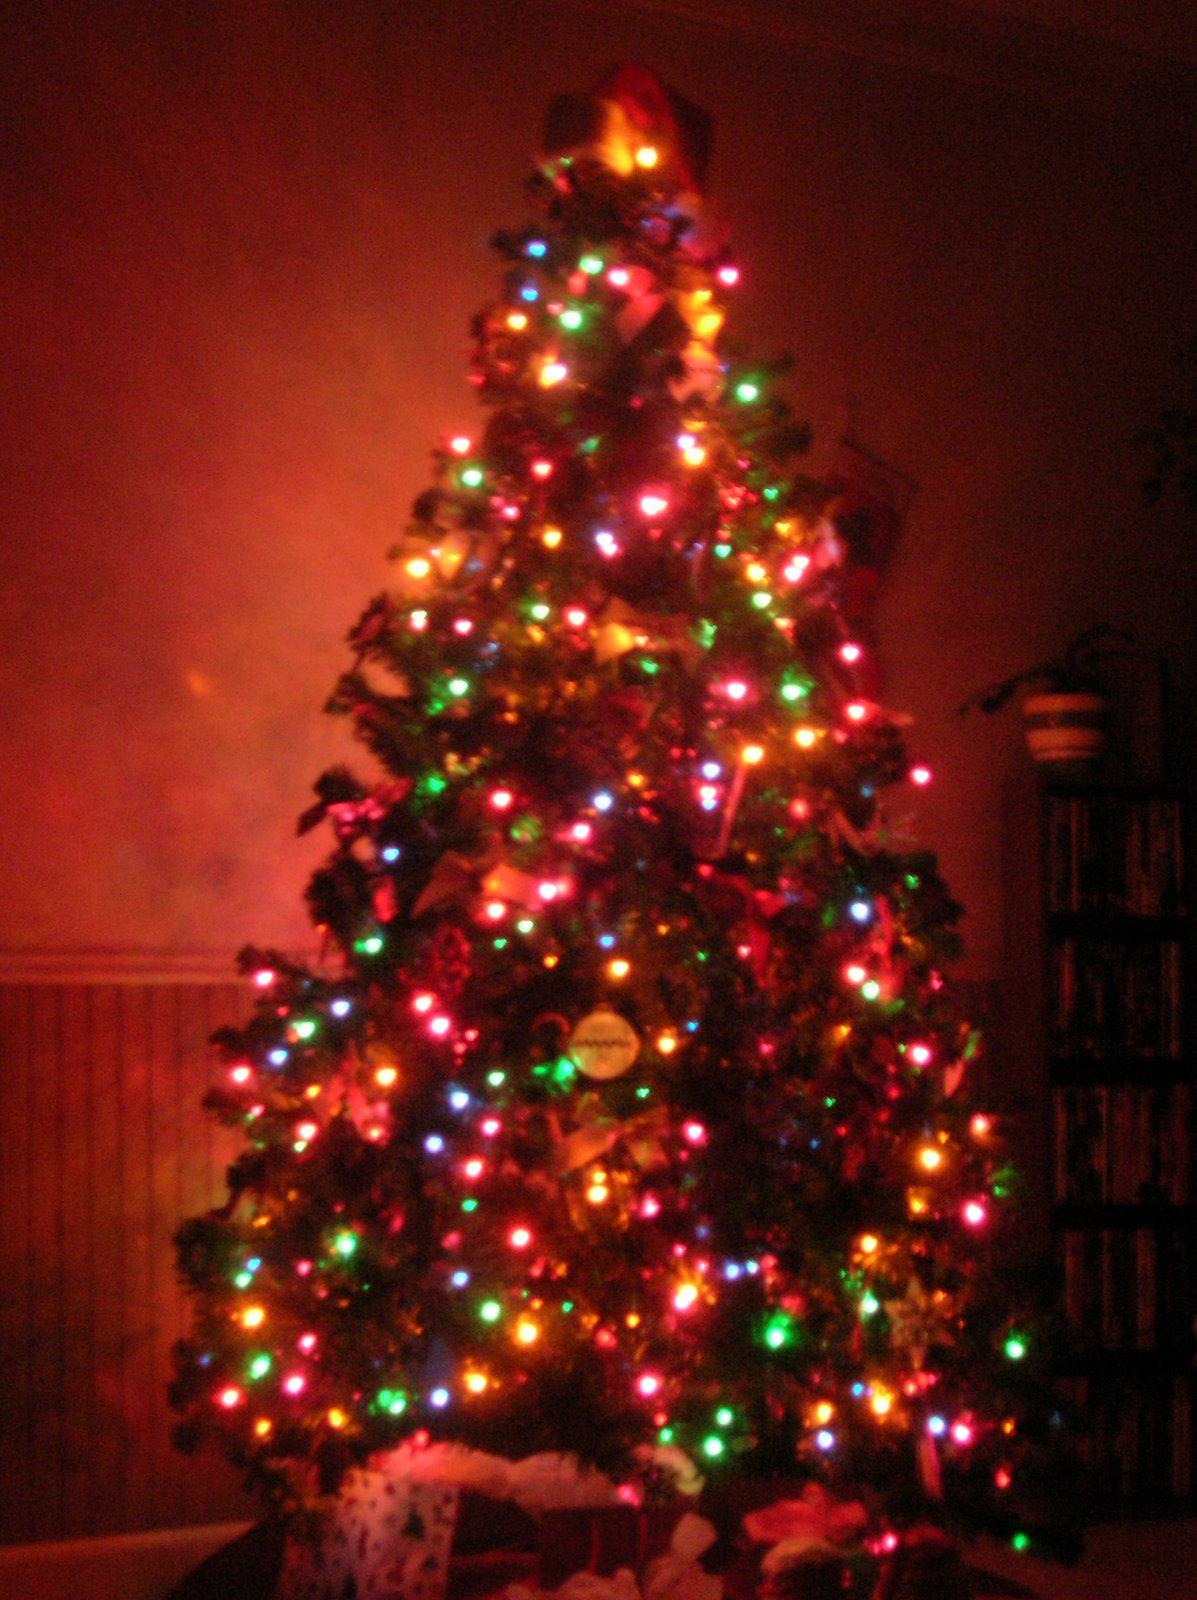 Mehndi Wallpaper Hd Christmas Tree Lights Hd Wallpapers Pulse